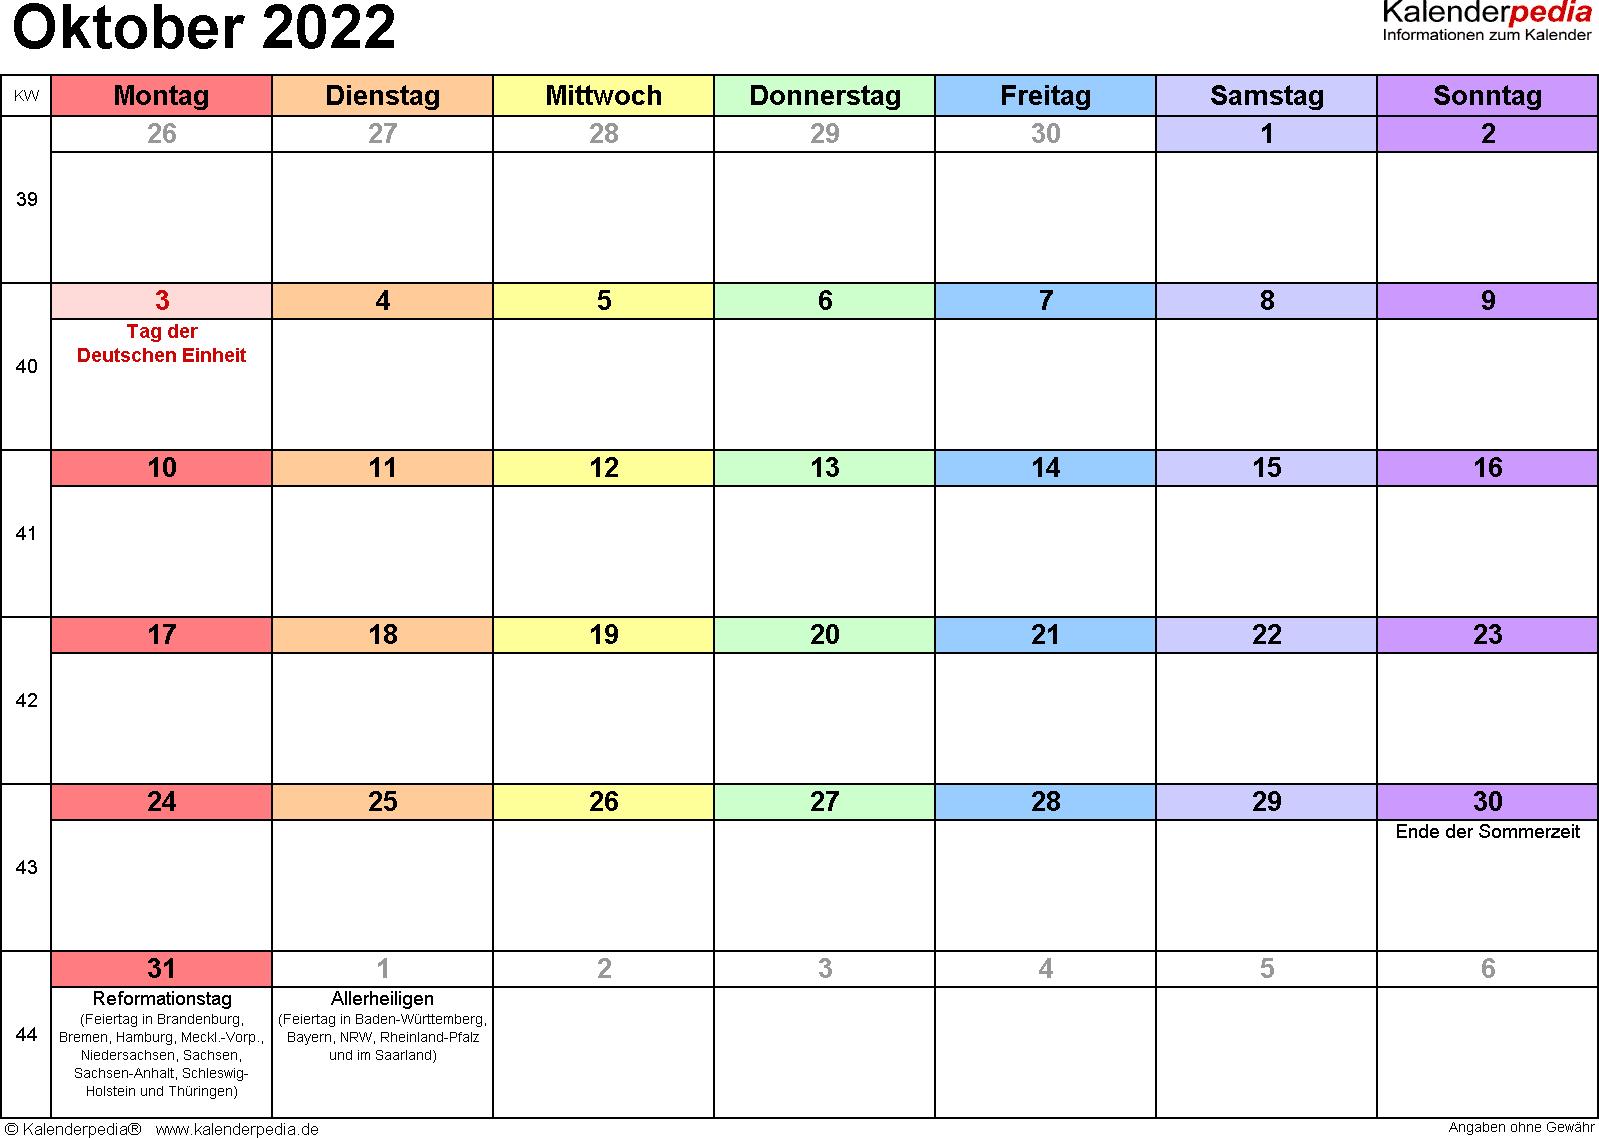 Kalender Oktober 2022 (Querformat) als PDF-Vorlage